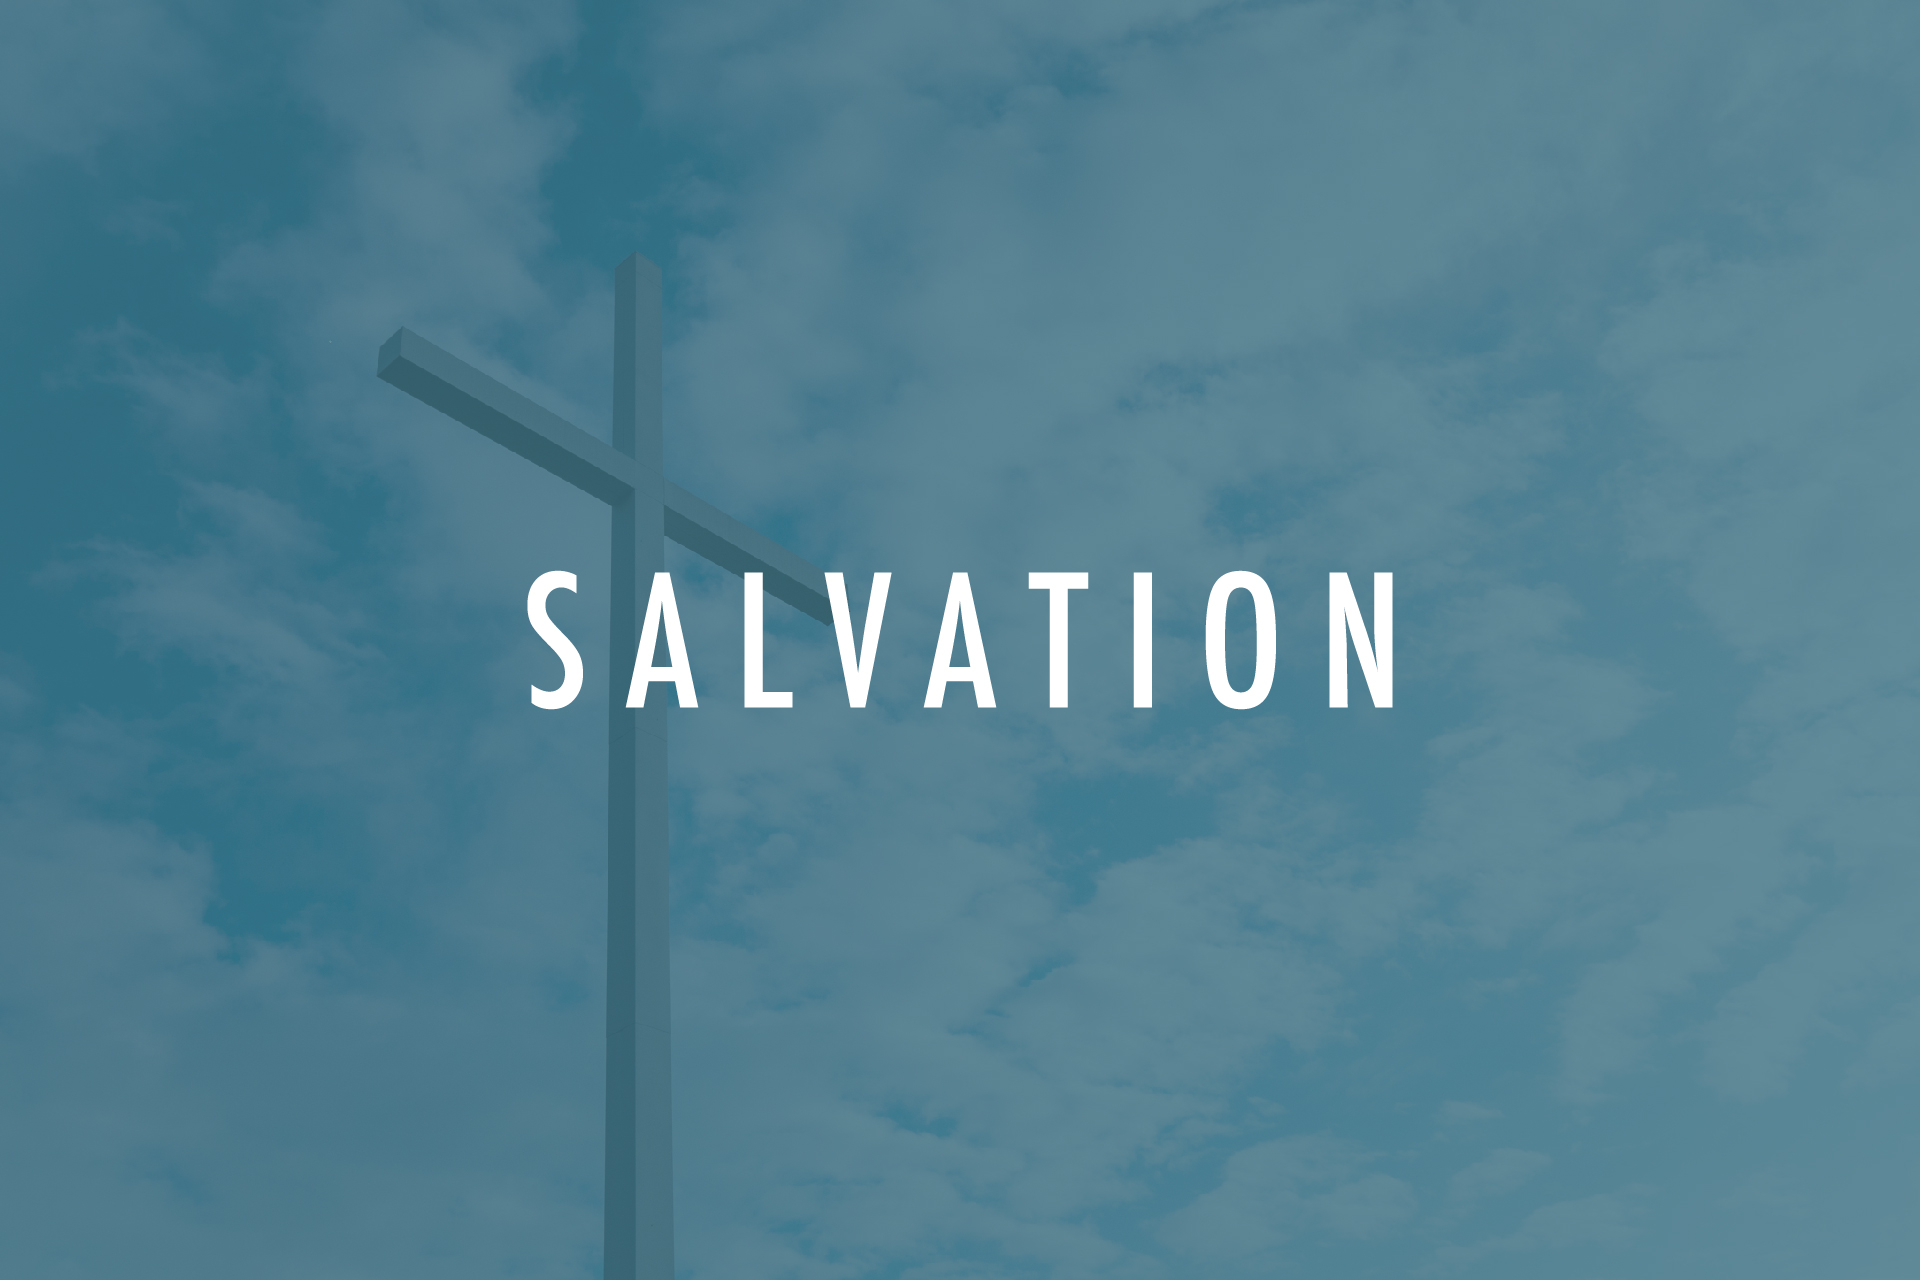 mhbc-salvation3-01.jpg